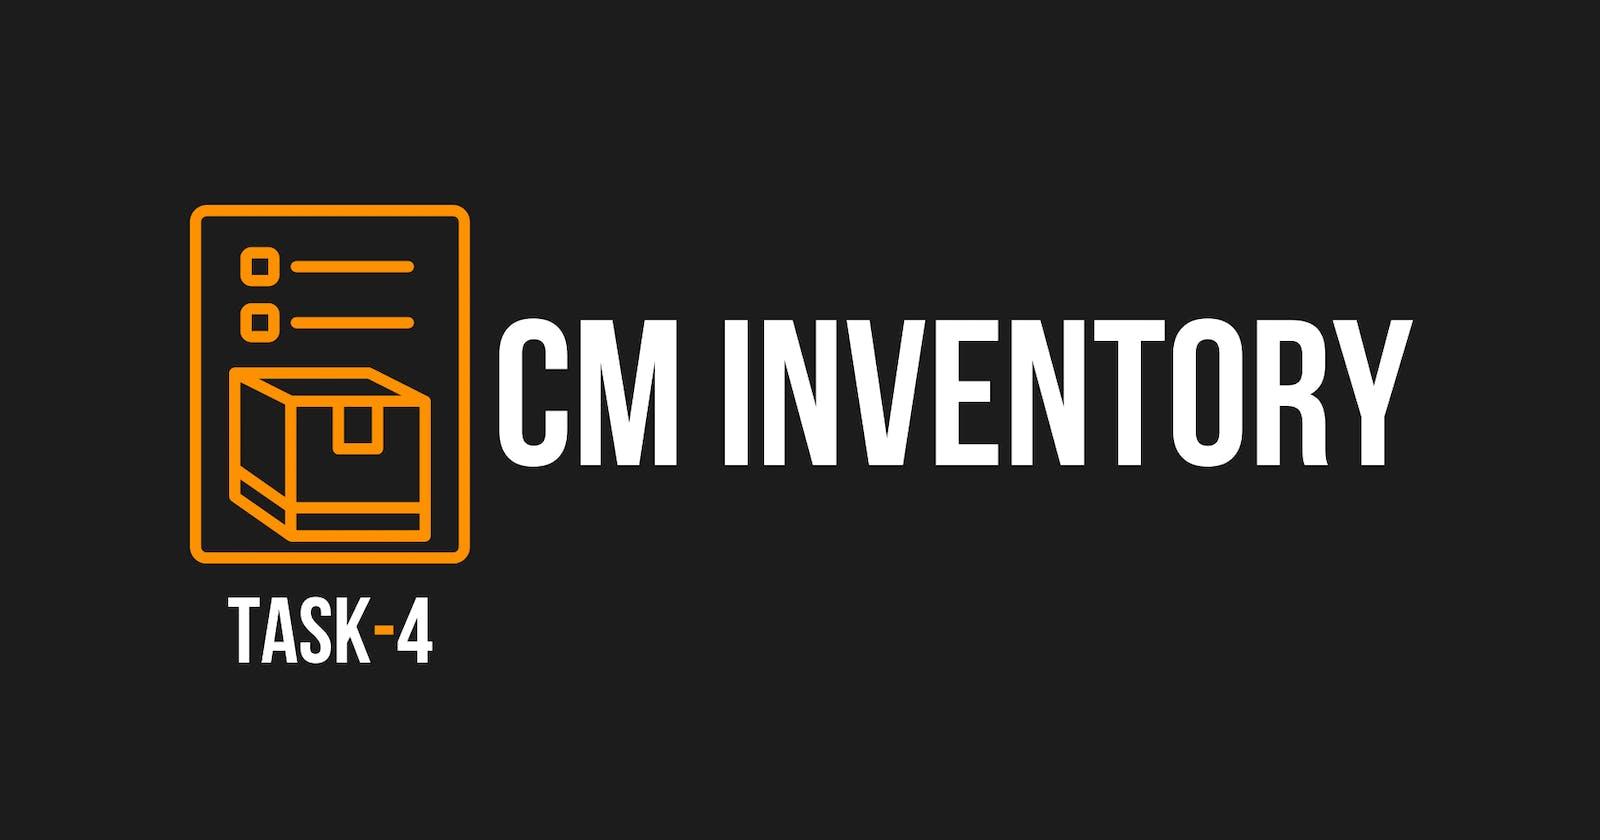 CM Inventory   Task - 4